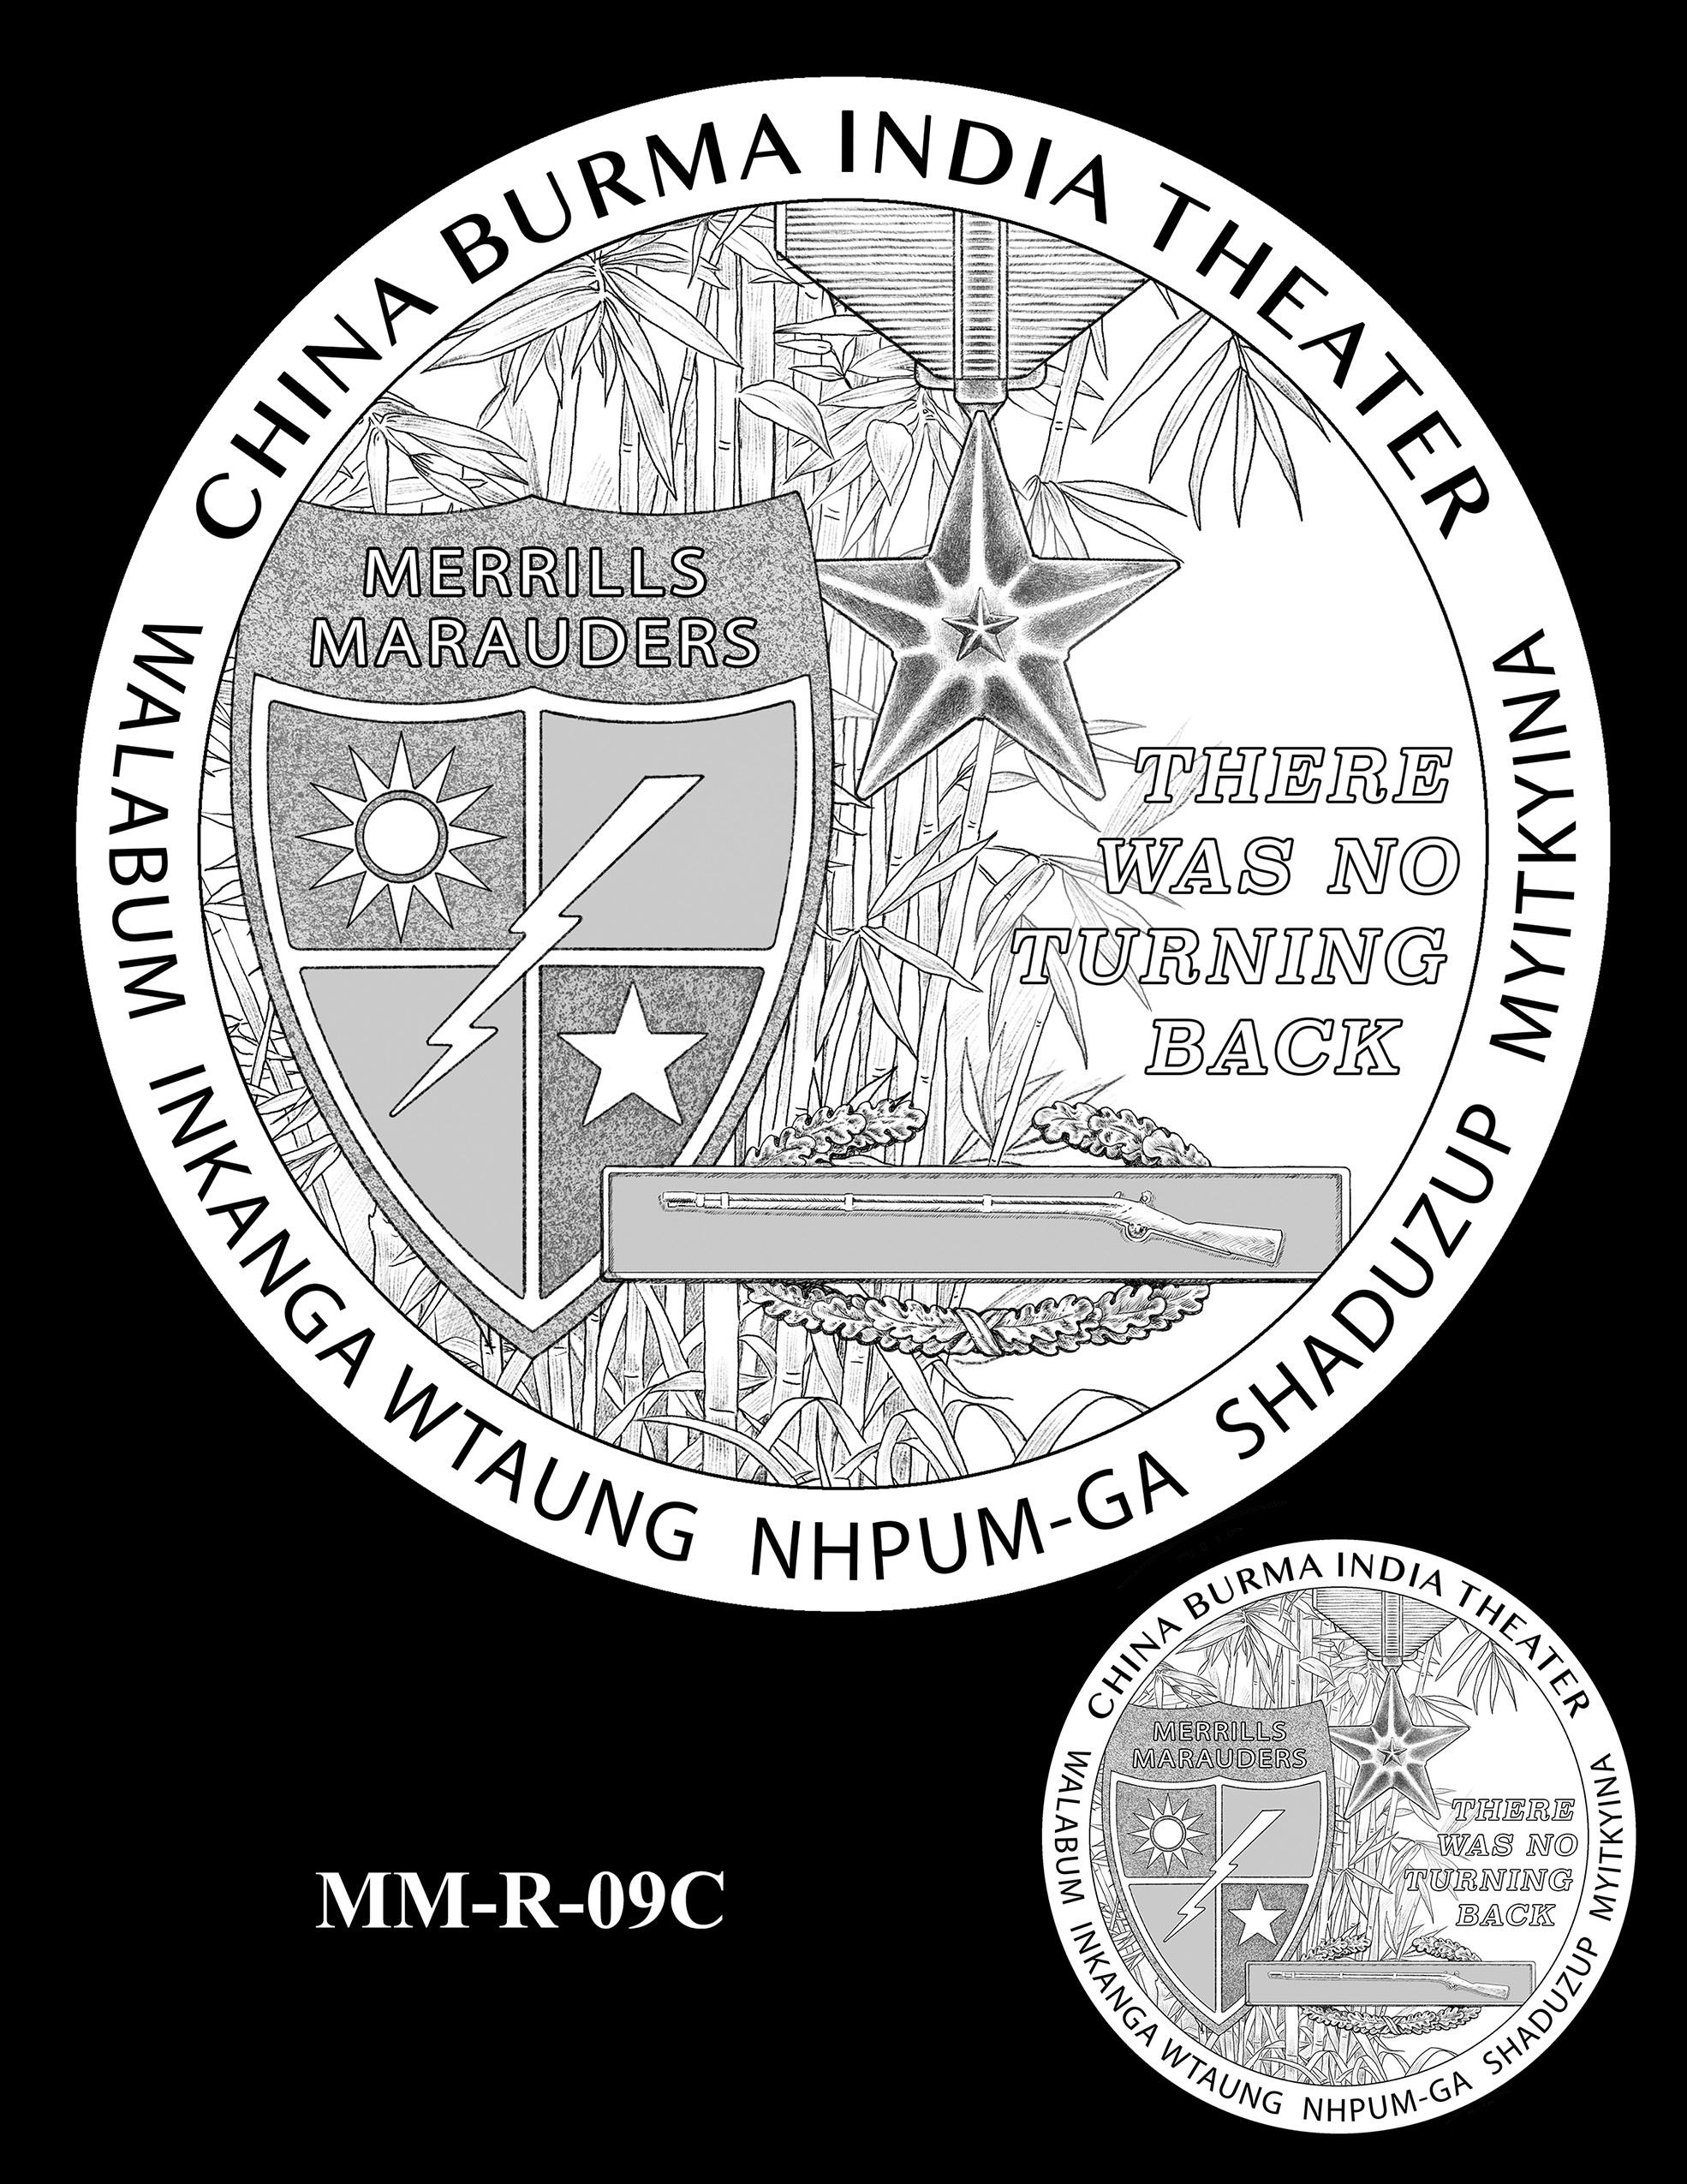 MM-R-09C -- Merrill's Marauders Congressional Gold Medal